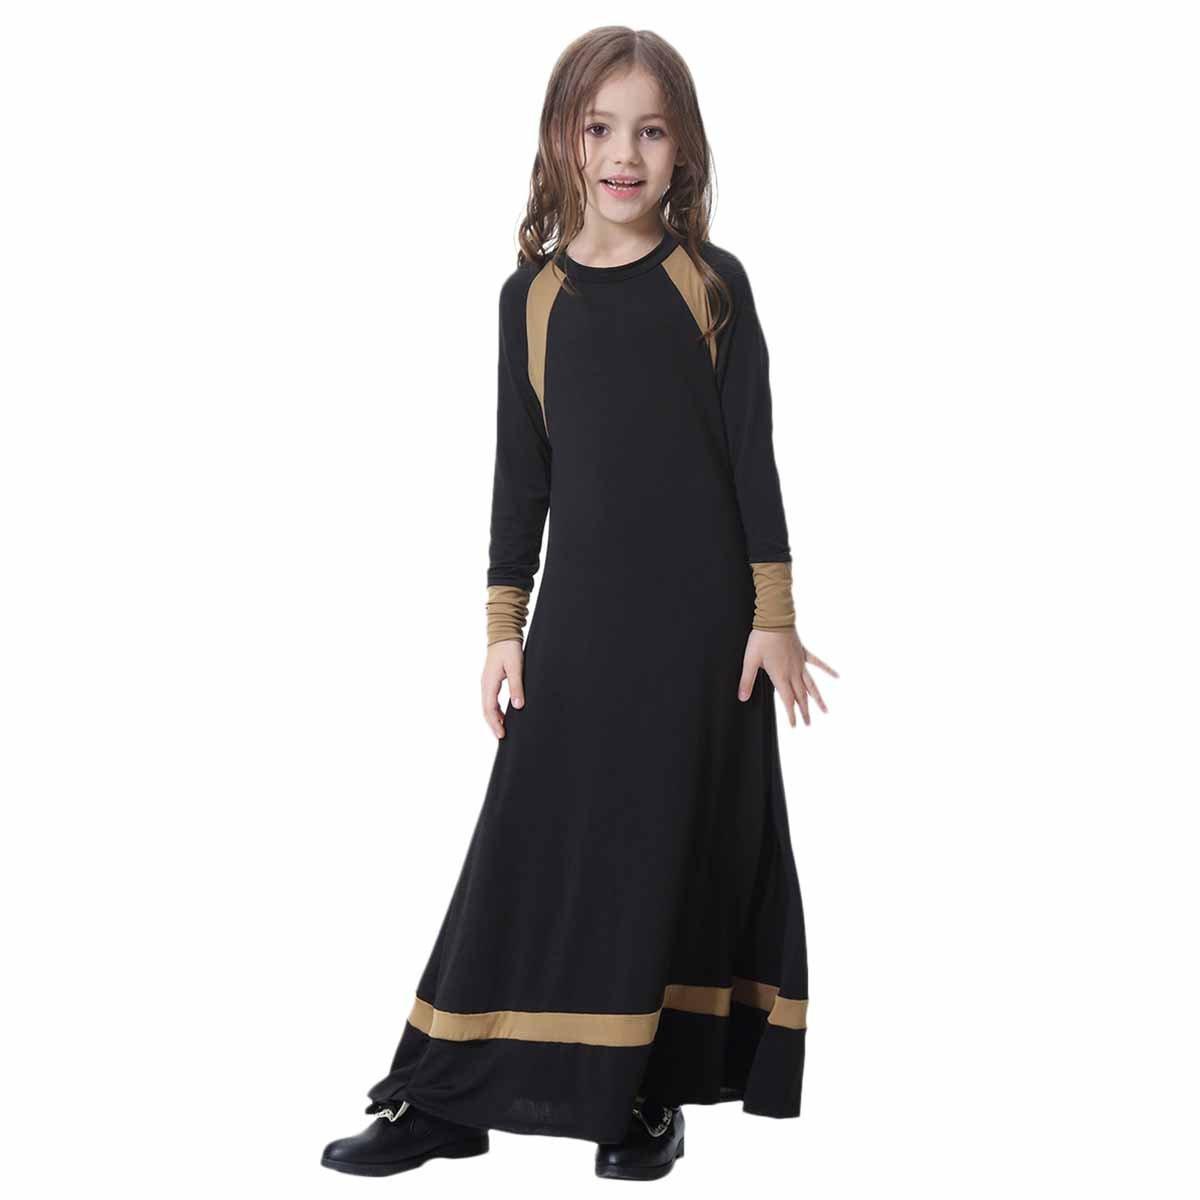 4ad86f3eb7dc Amazon.com: IWEMEK Kids Girls Muslim Islamic Dress Long Sleeves Soft Full  Length Robe Burka Arab Prayer Maxi Abaya Kaftan Dress: Clothing